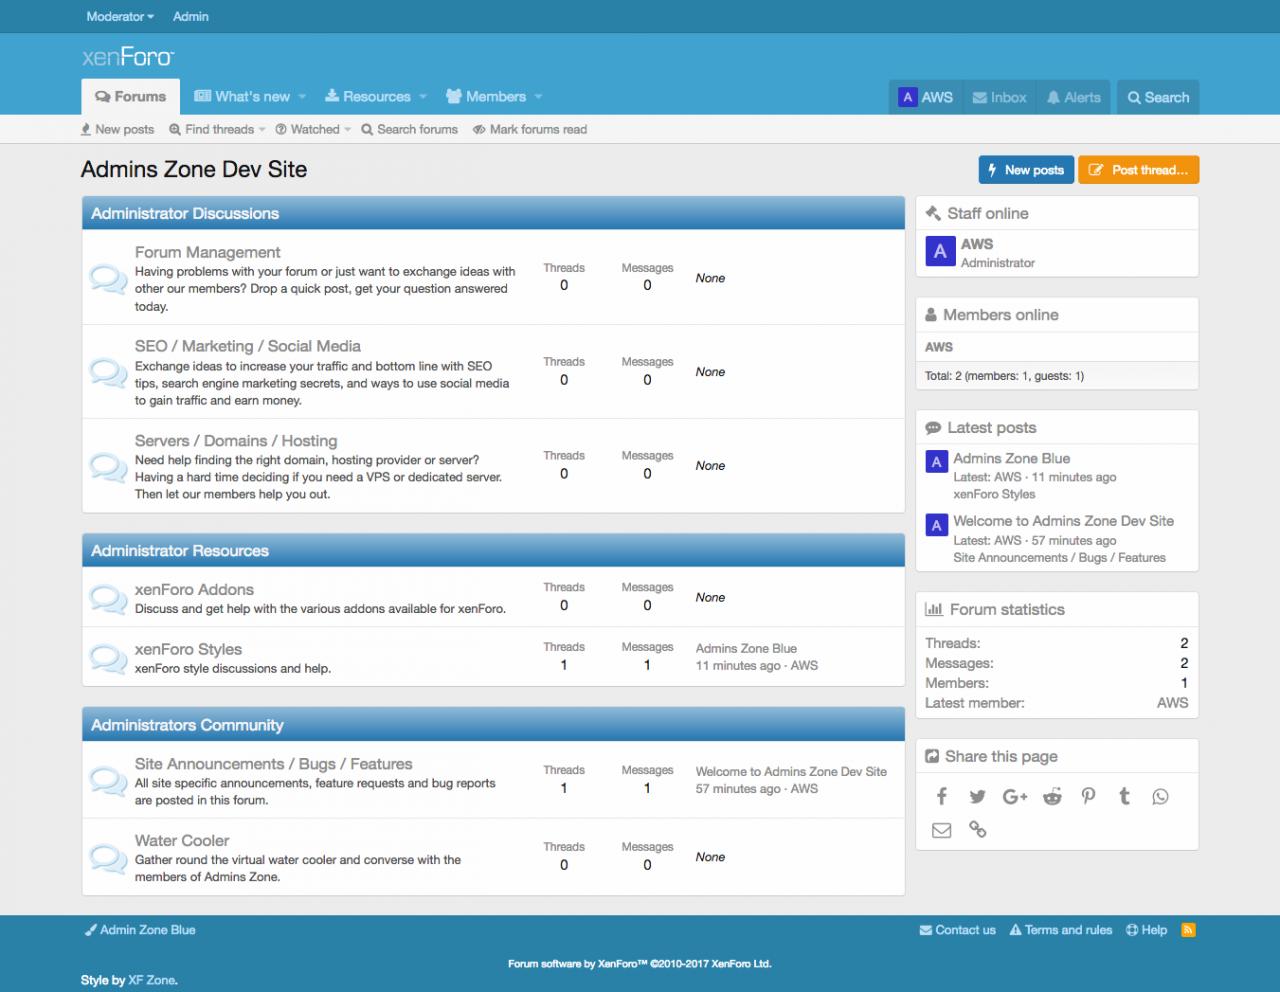 Screenshot-2018-1-2 Admins Zone Dev Site.png